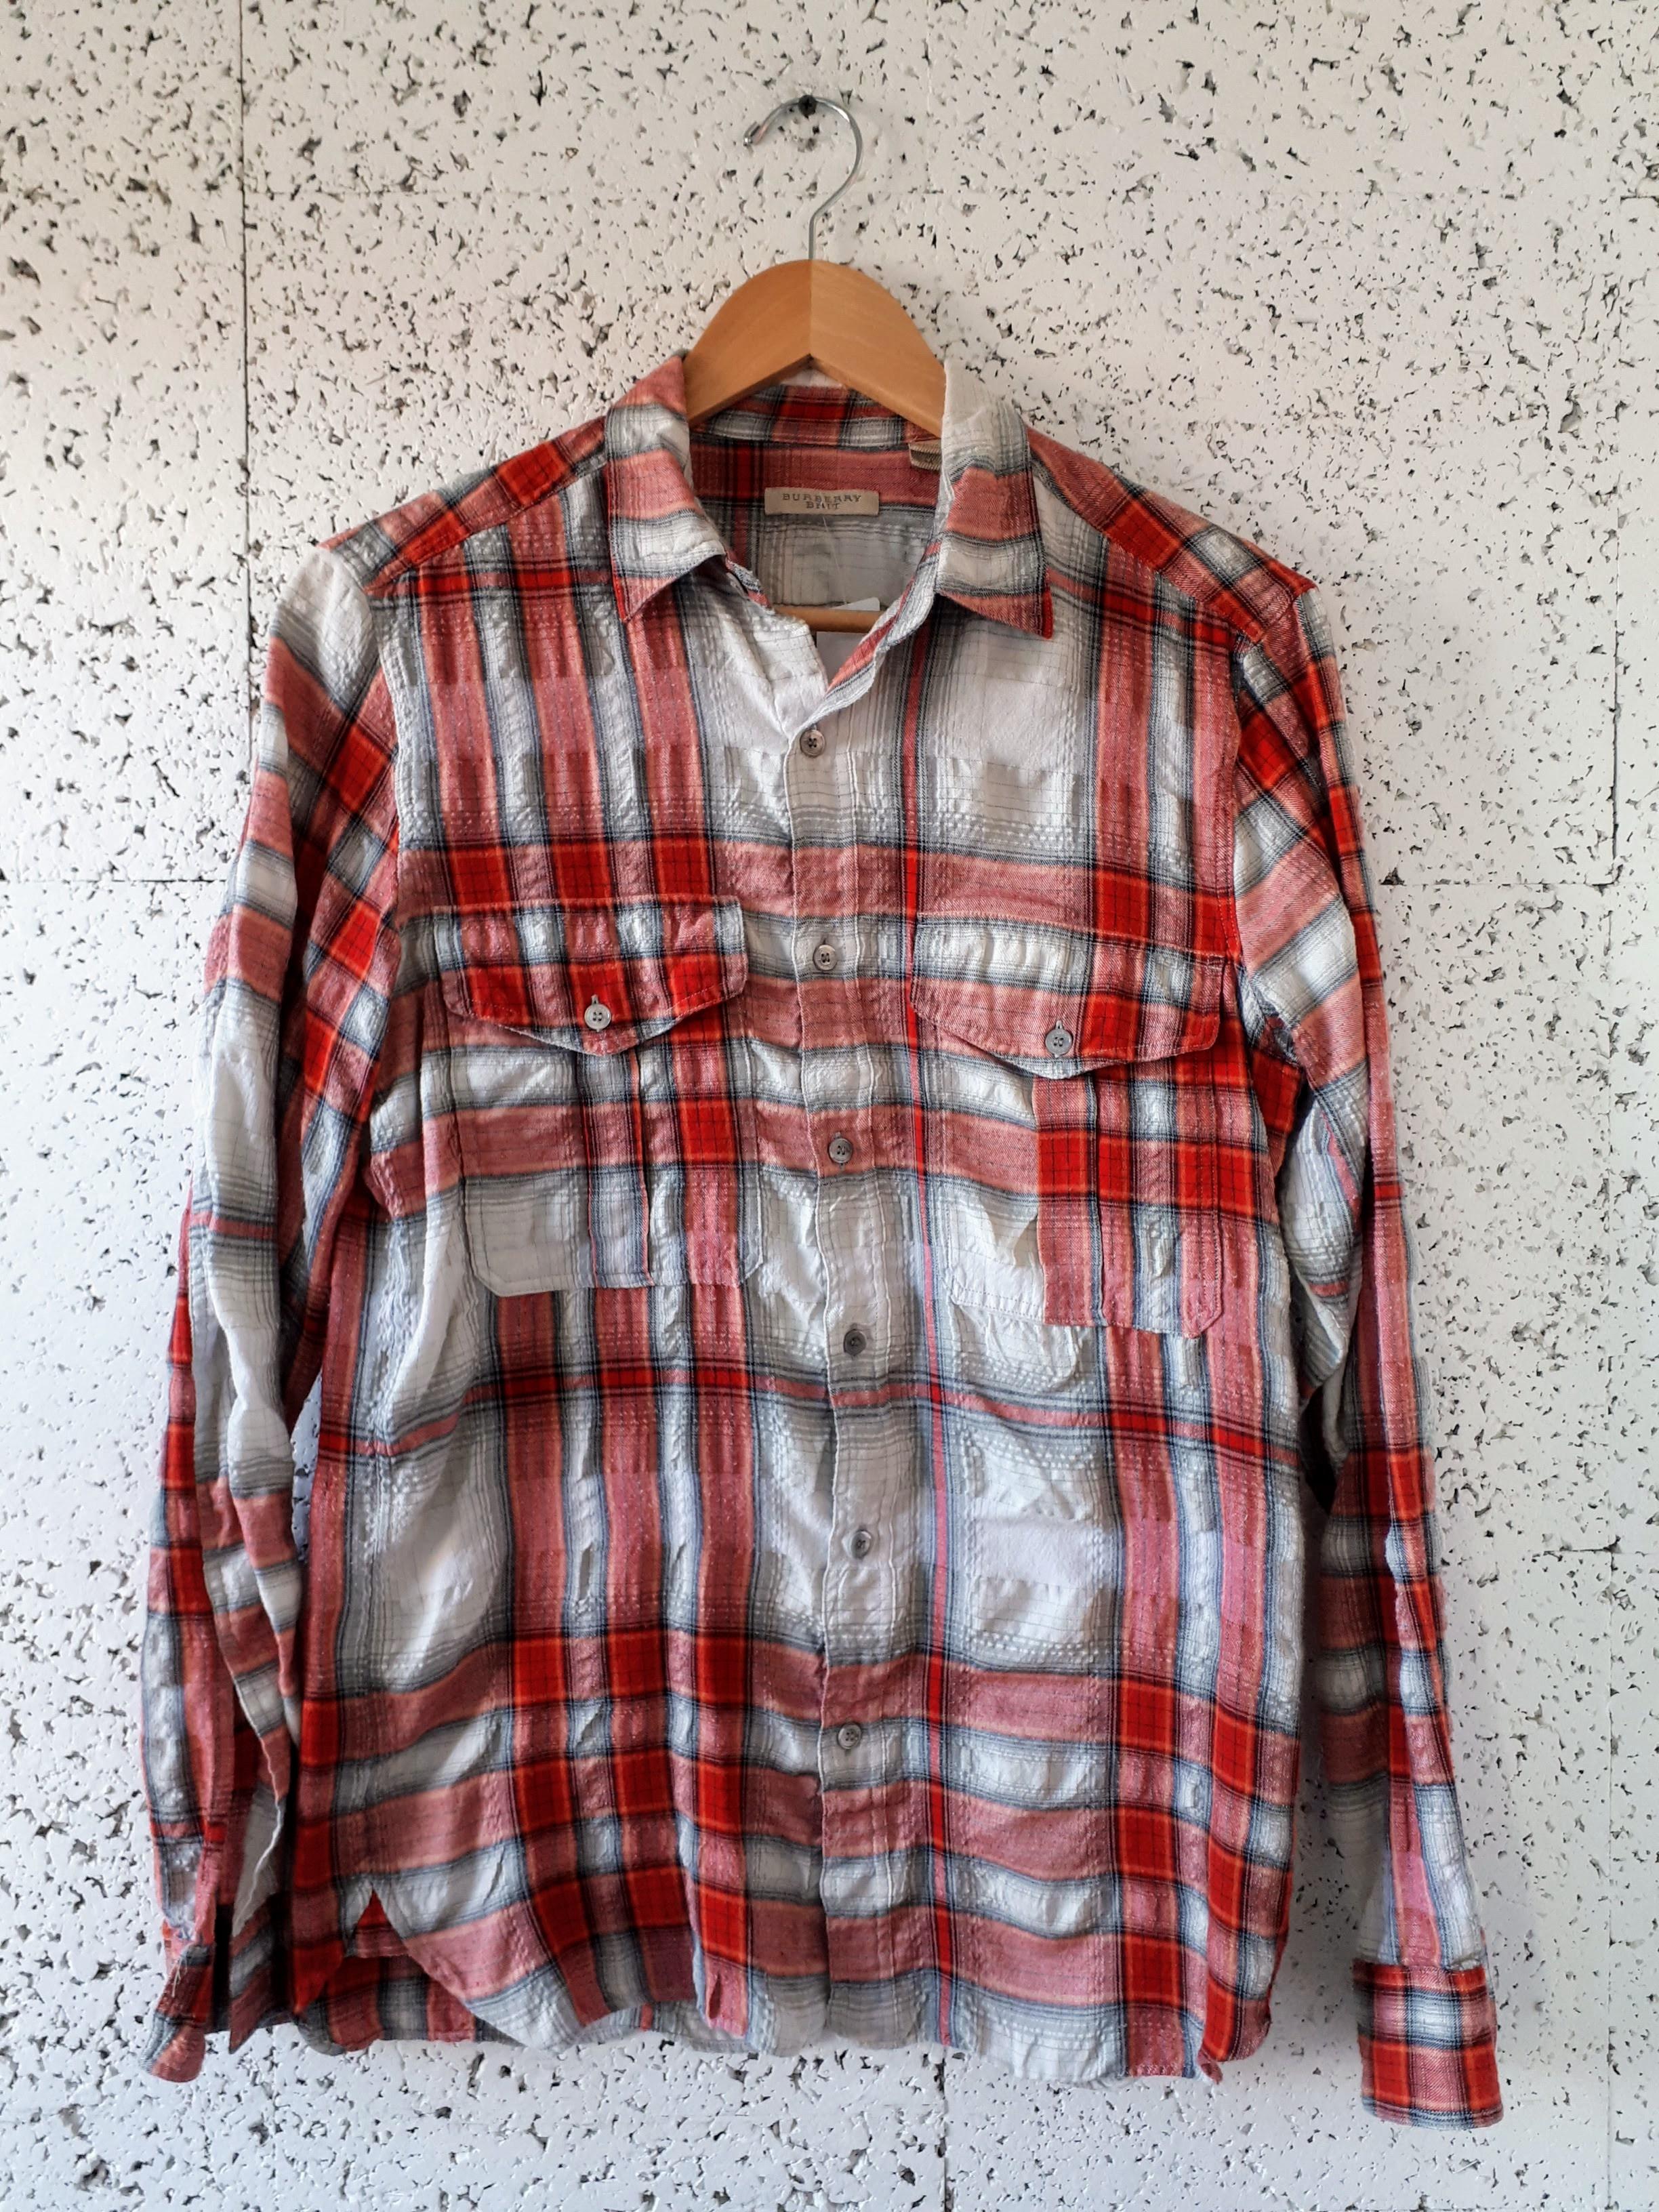 Burberry Brit shirt; Size S, $40